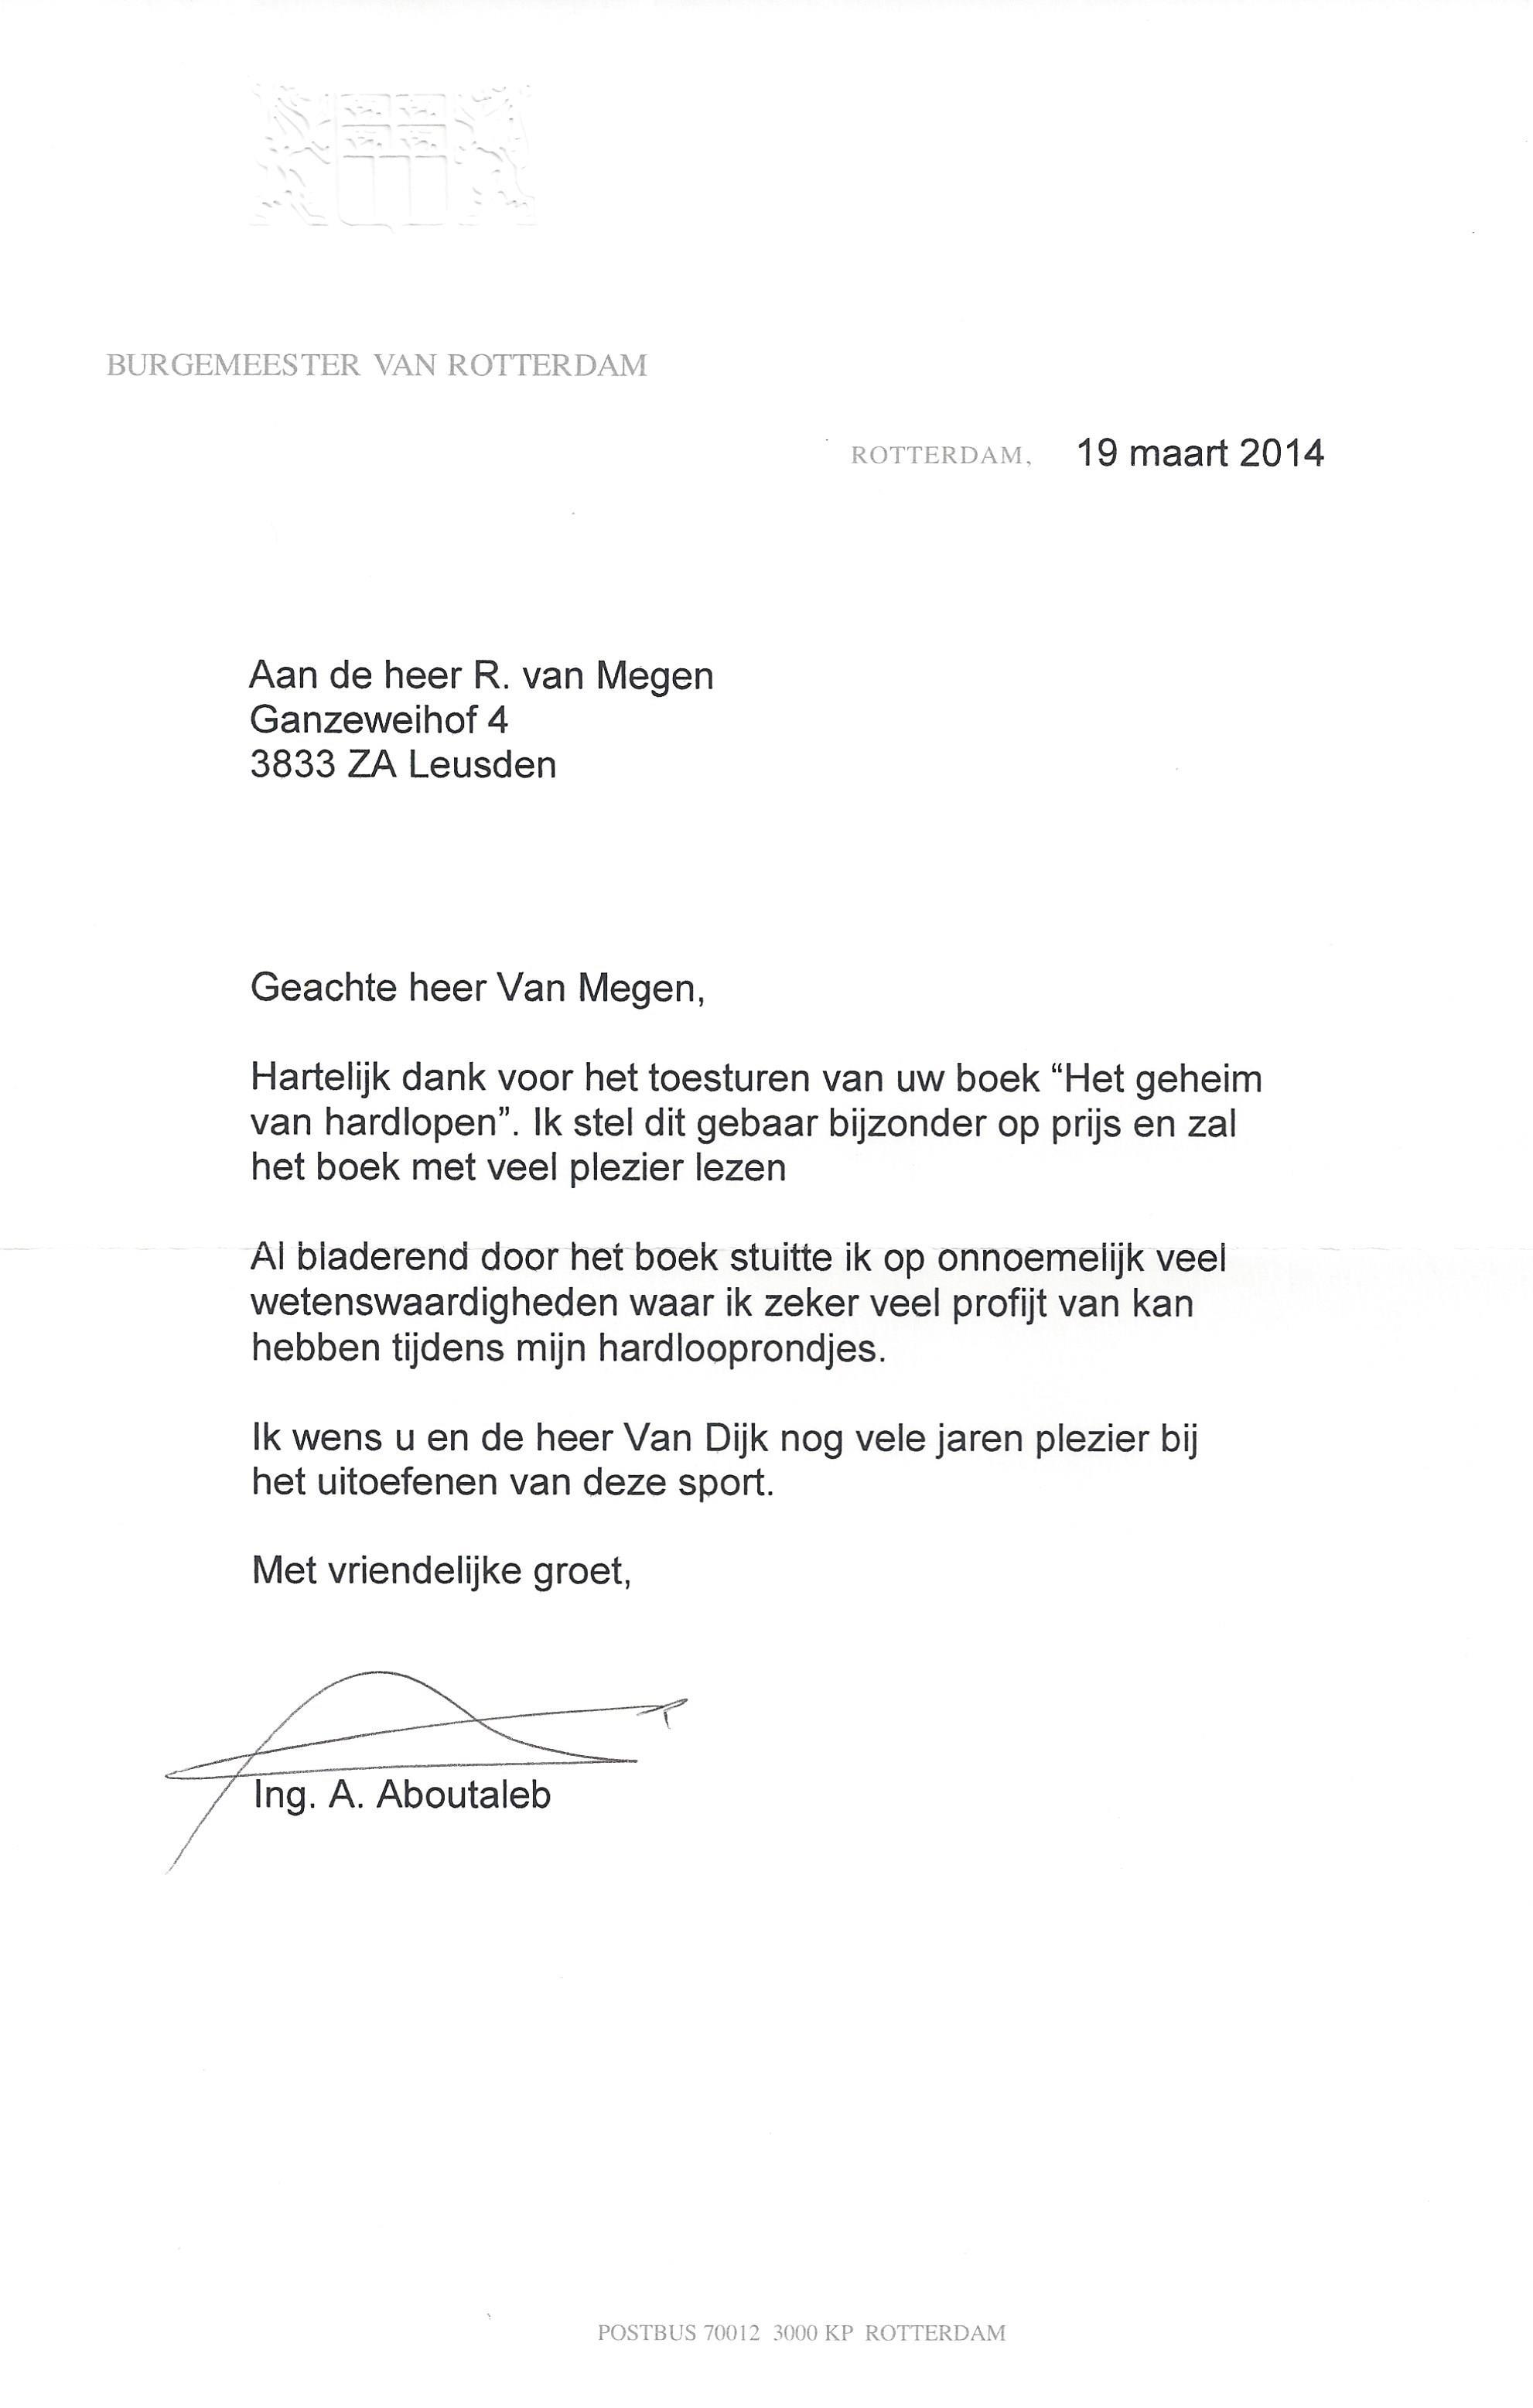 20140319 brief burgemeester van Rotterdam de heer ing A Aboutaleb